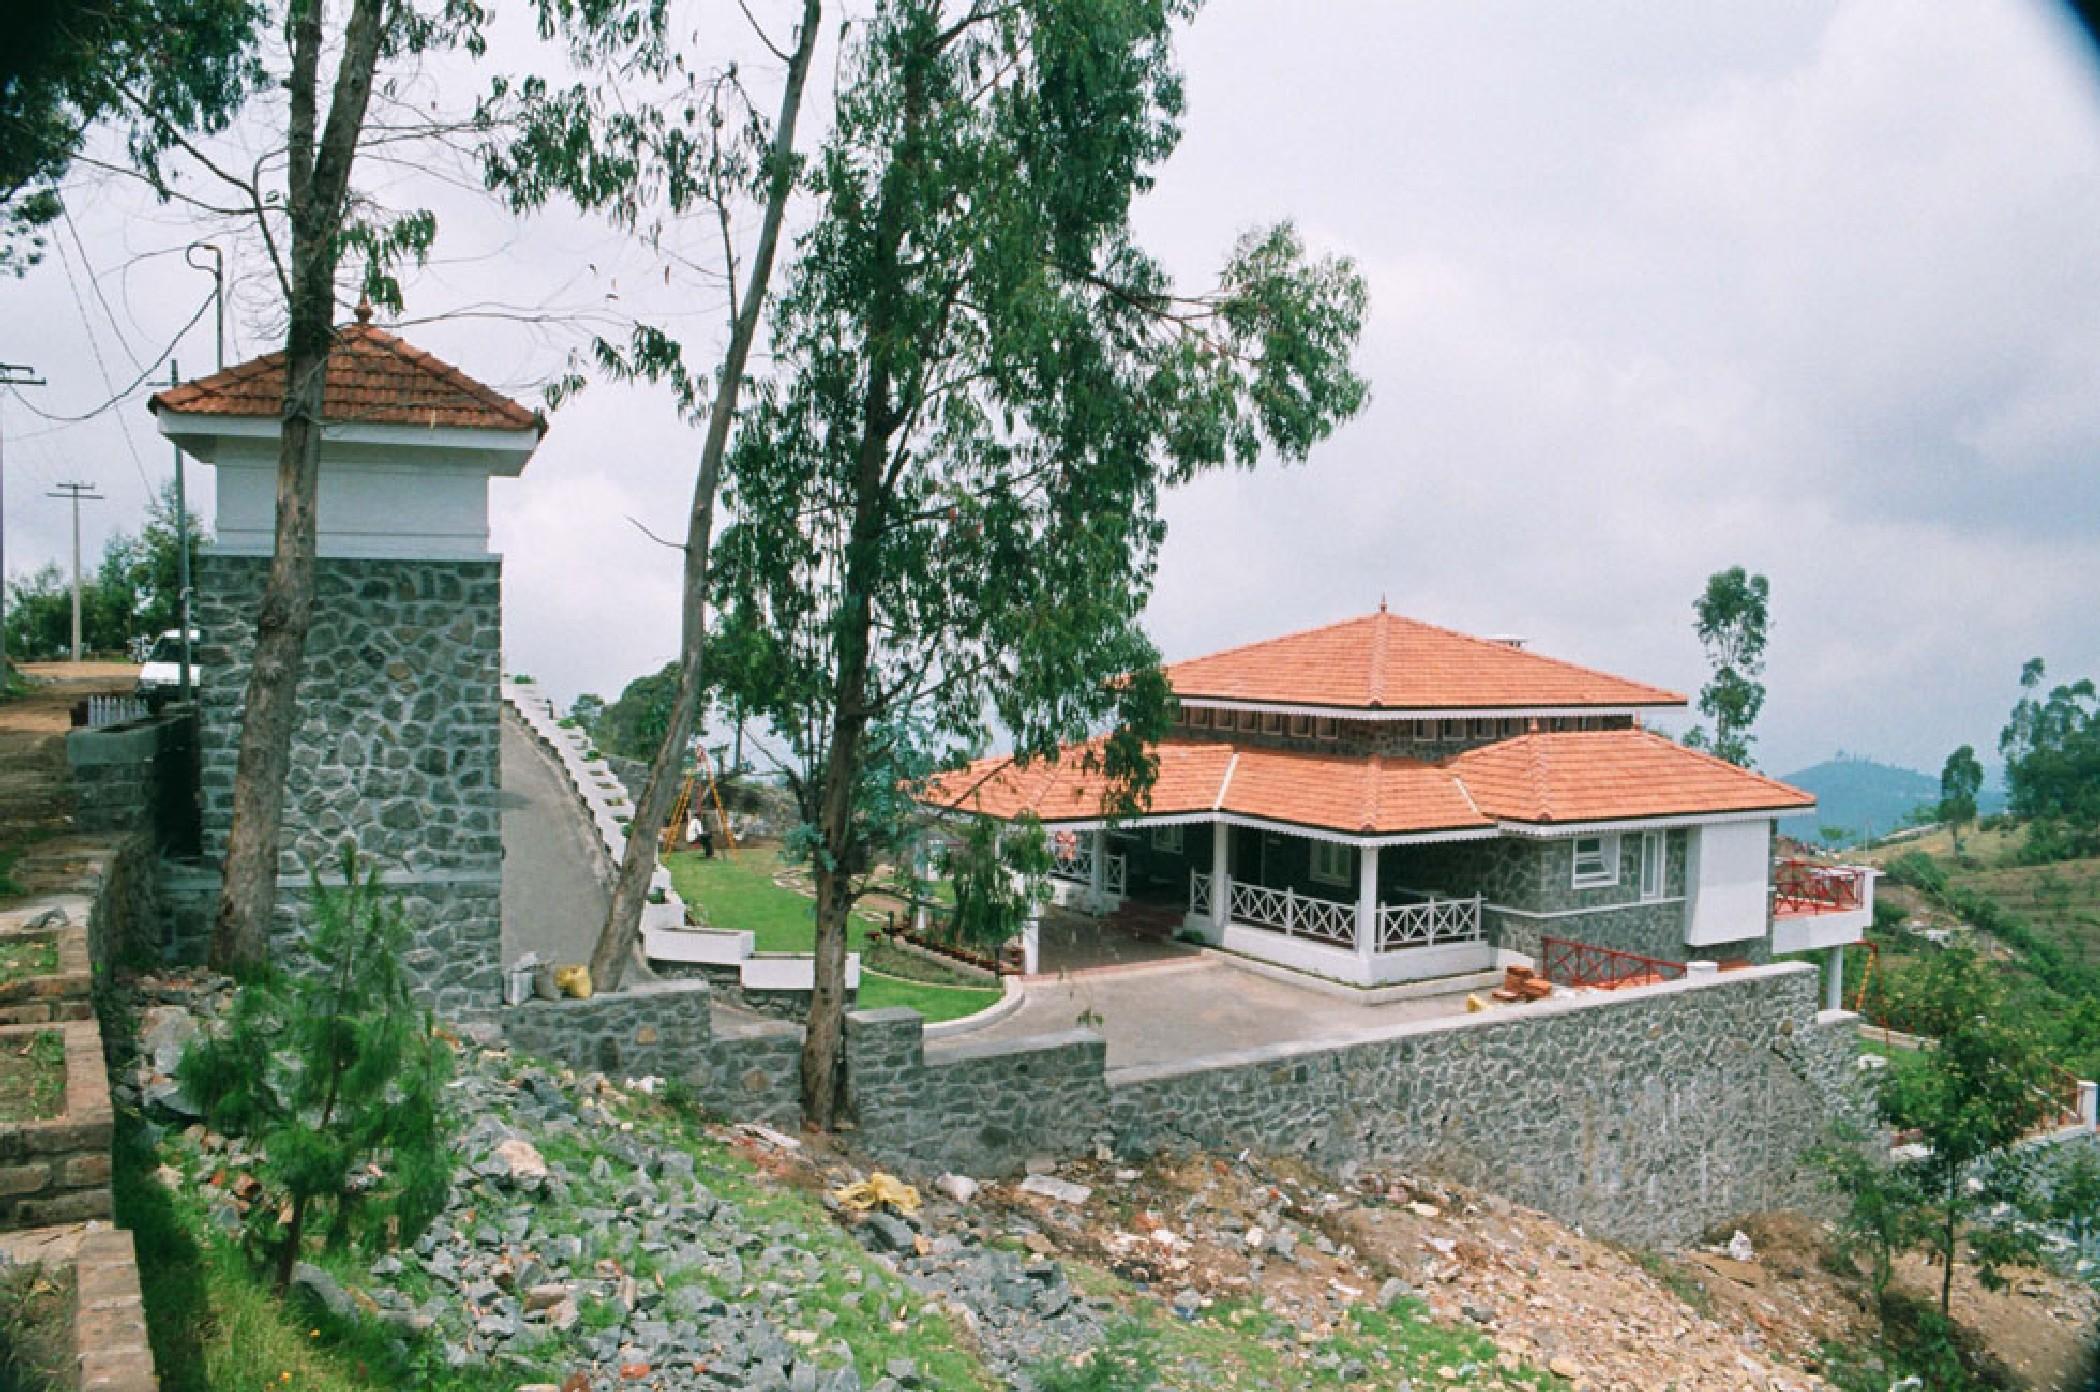 green building designs case study in india green design ideas home